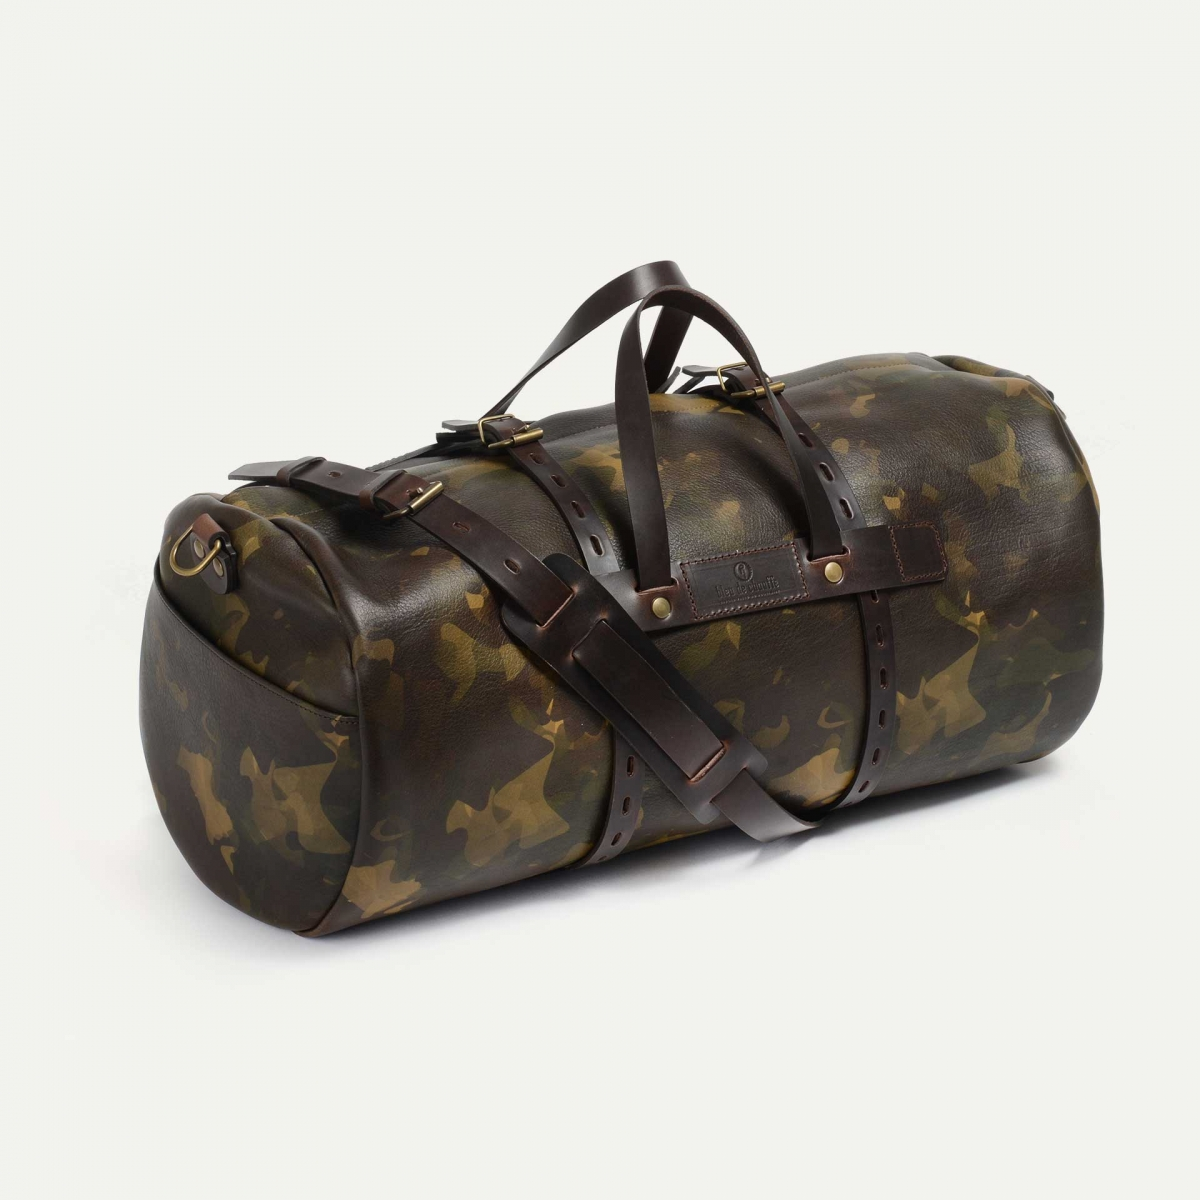 Bivouac travel bag - Camo (image n°2)